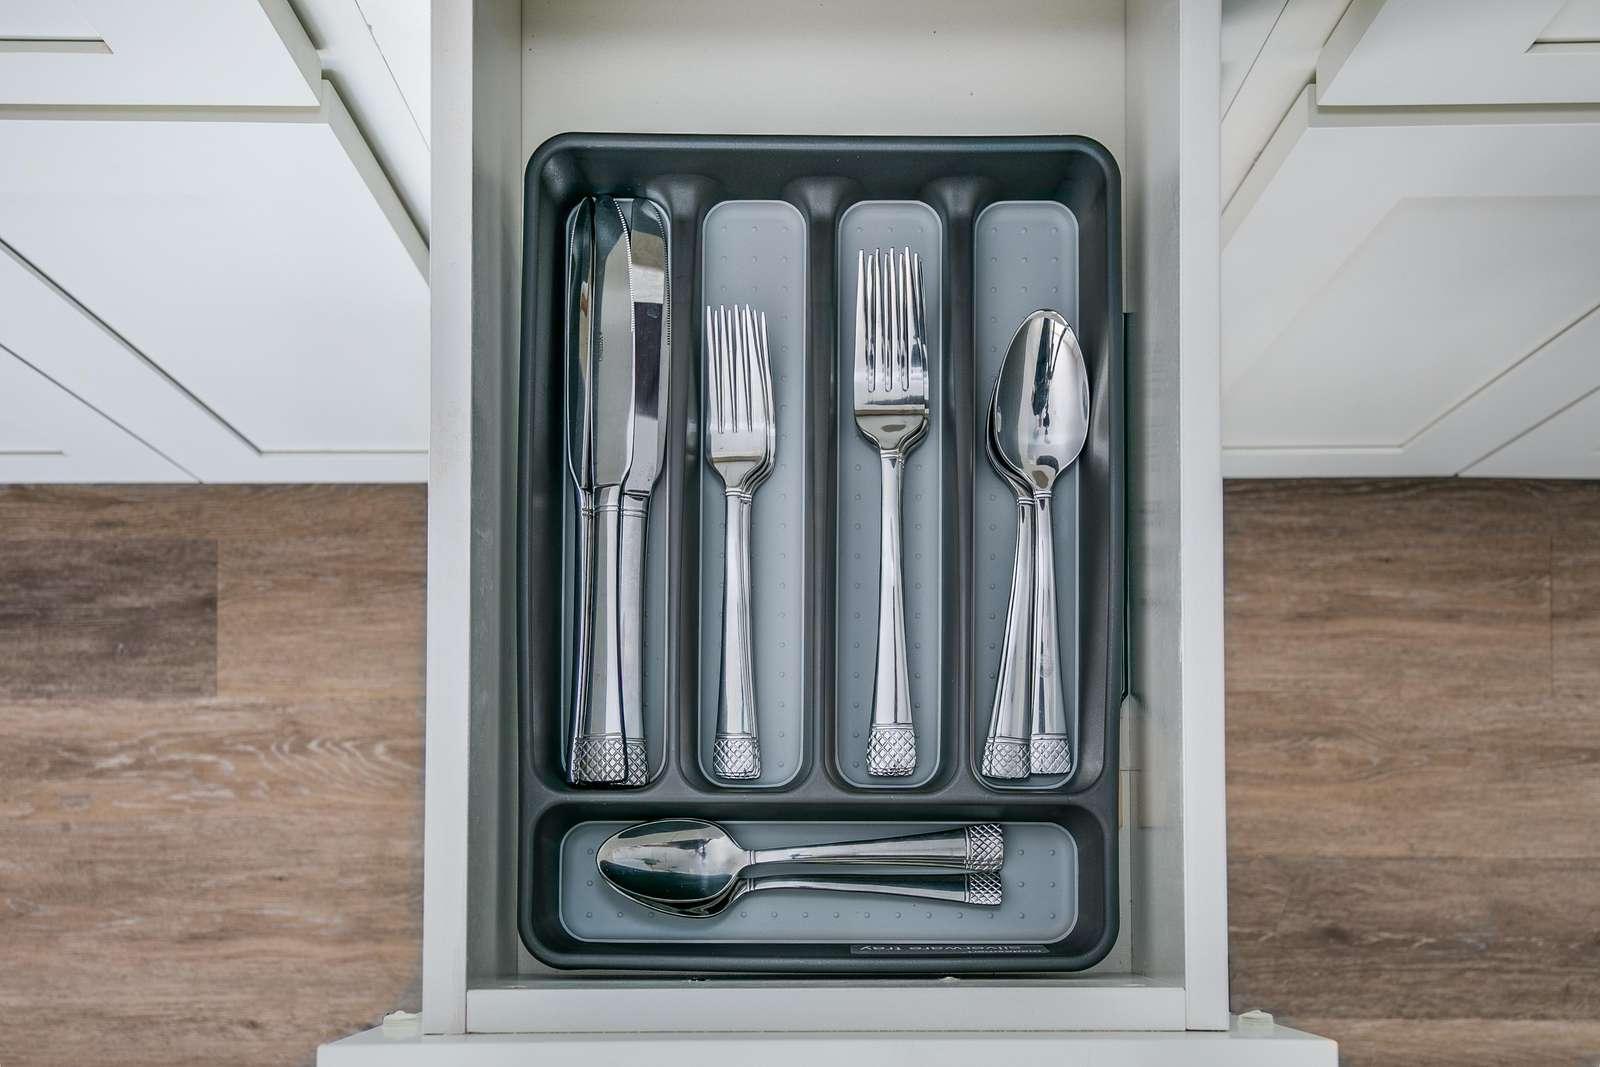 New Cutlery